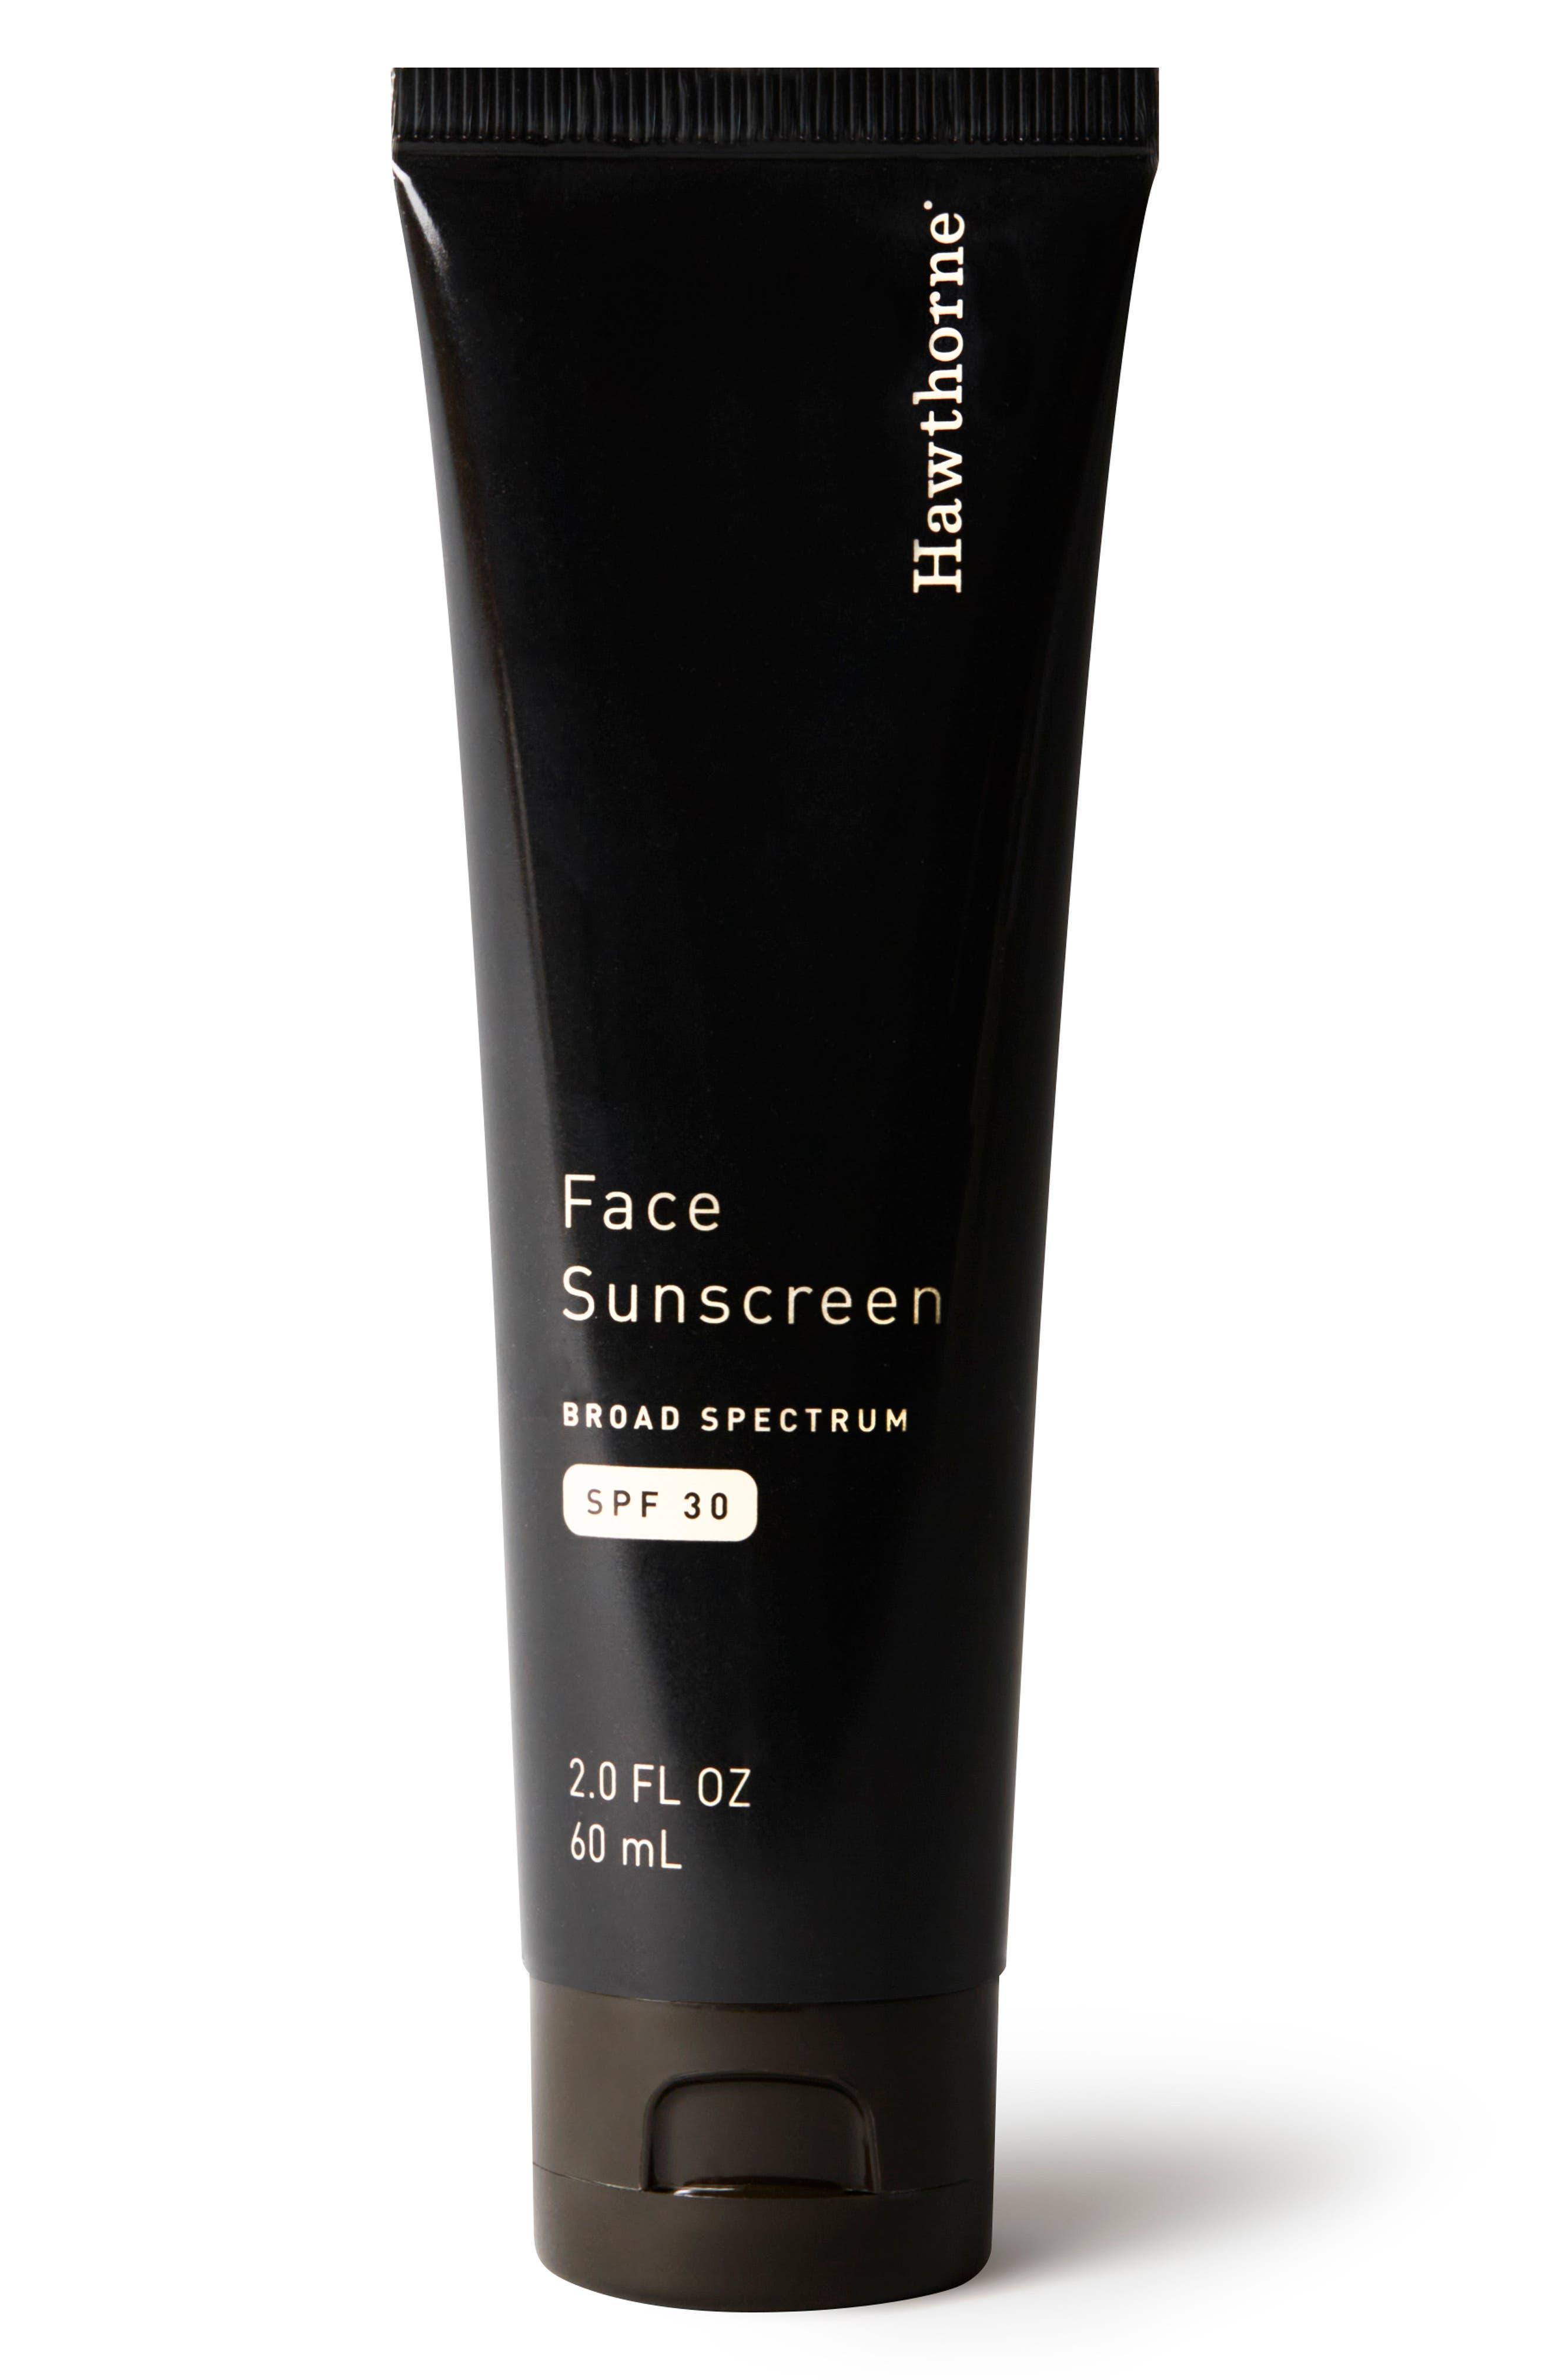 Face Sunscreen Broad Spectrum SPF 30 | Nordstrom